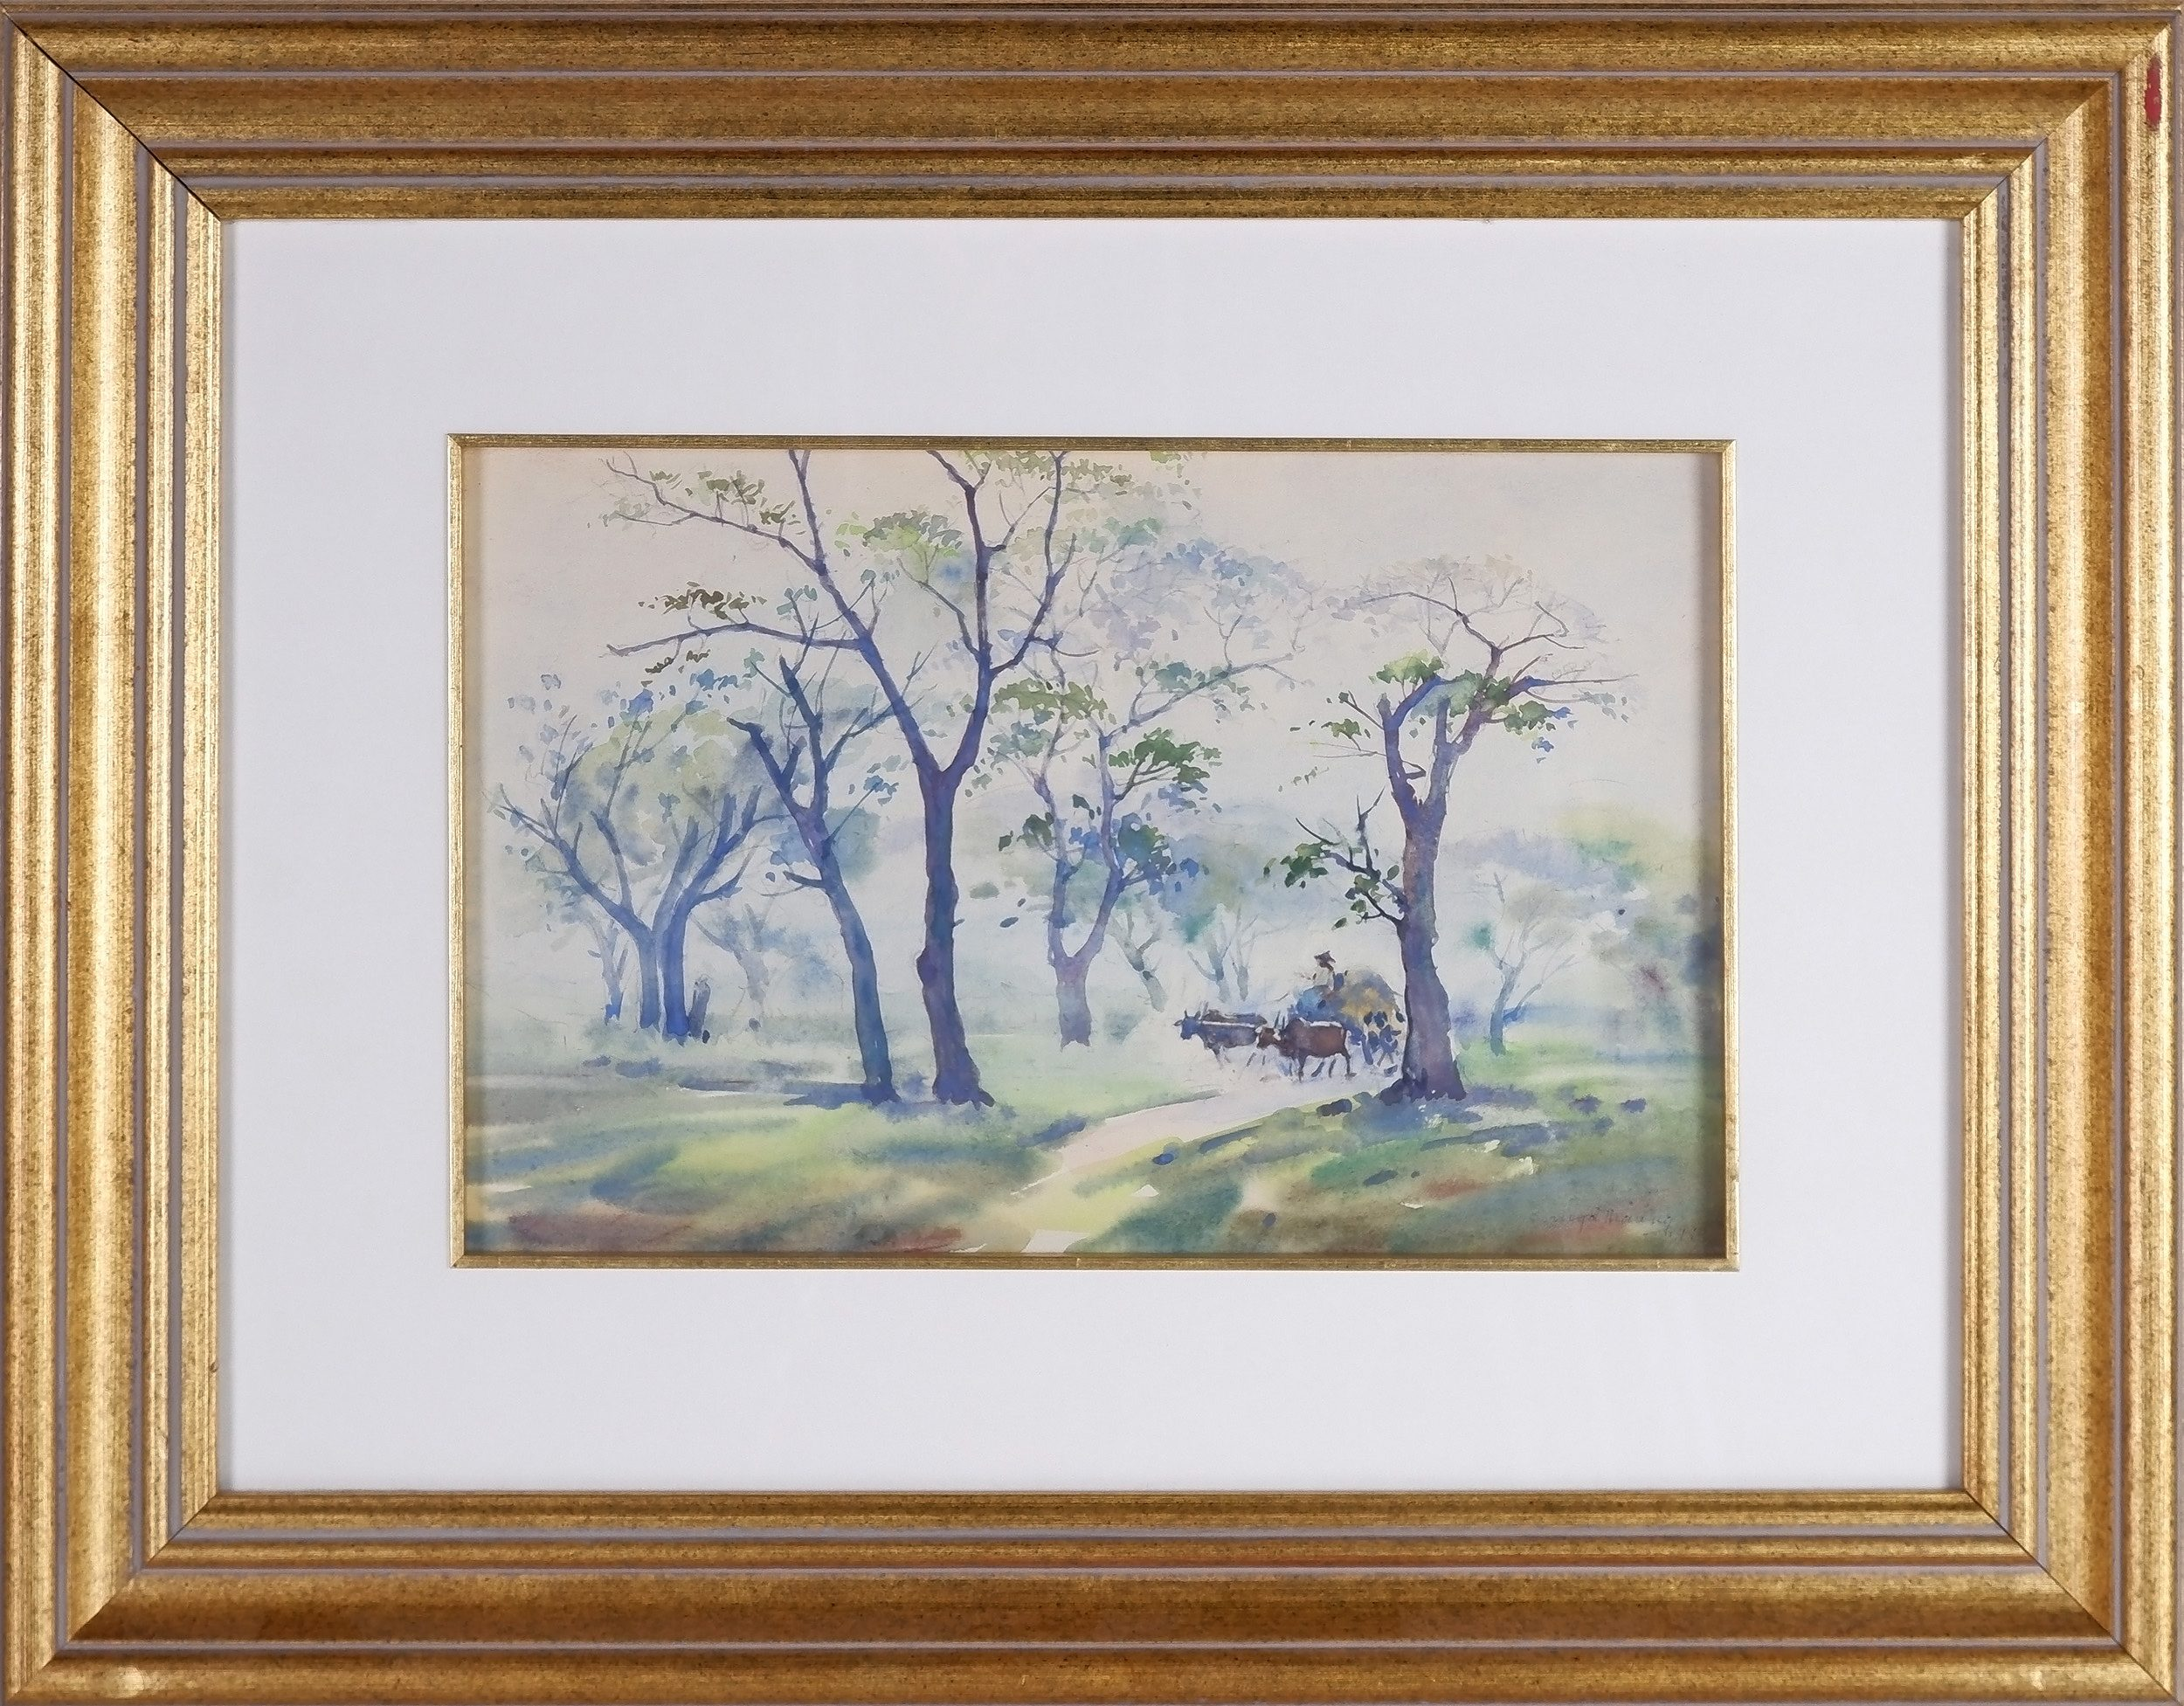 'Mya Thaung  (Burmese 1943-) Farmers Road 1990, Watercolour'